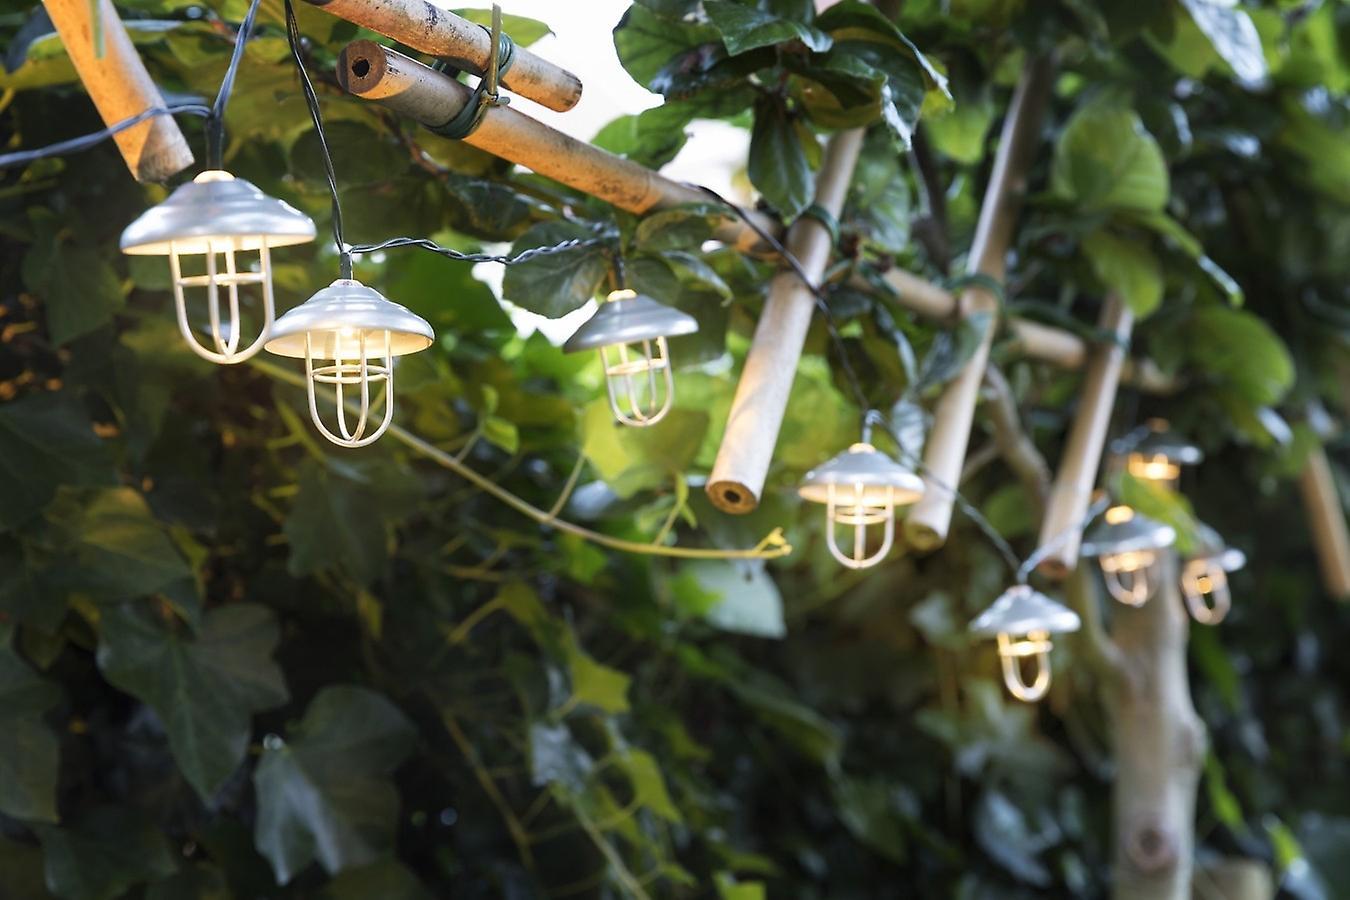 LED LOVERS Denver , Garden Solar Lantern Chain  , Strips of 10 Solar Energy LED Lights Deco Fairy Lights Parties, Receptions, Weddings